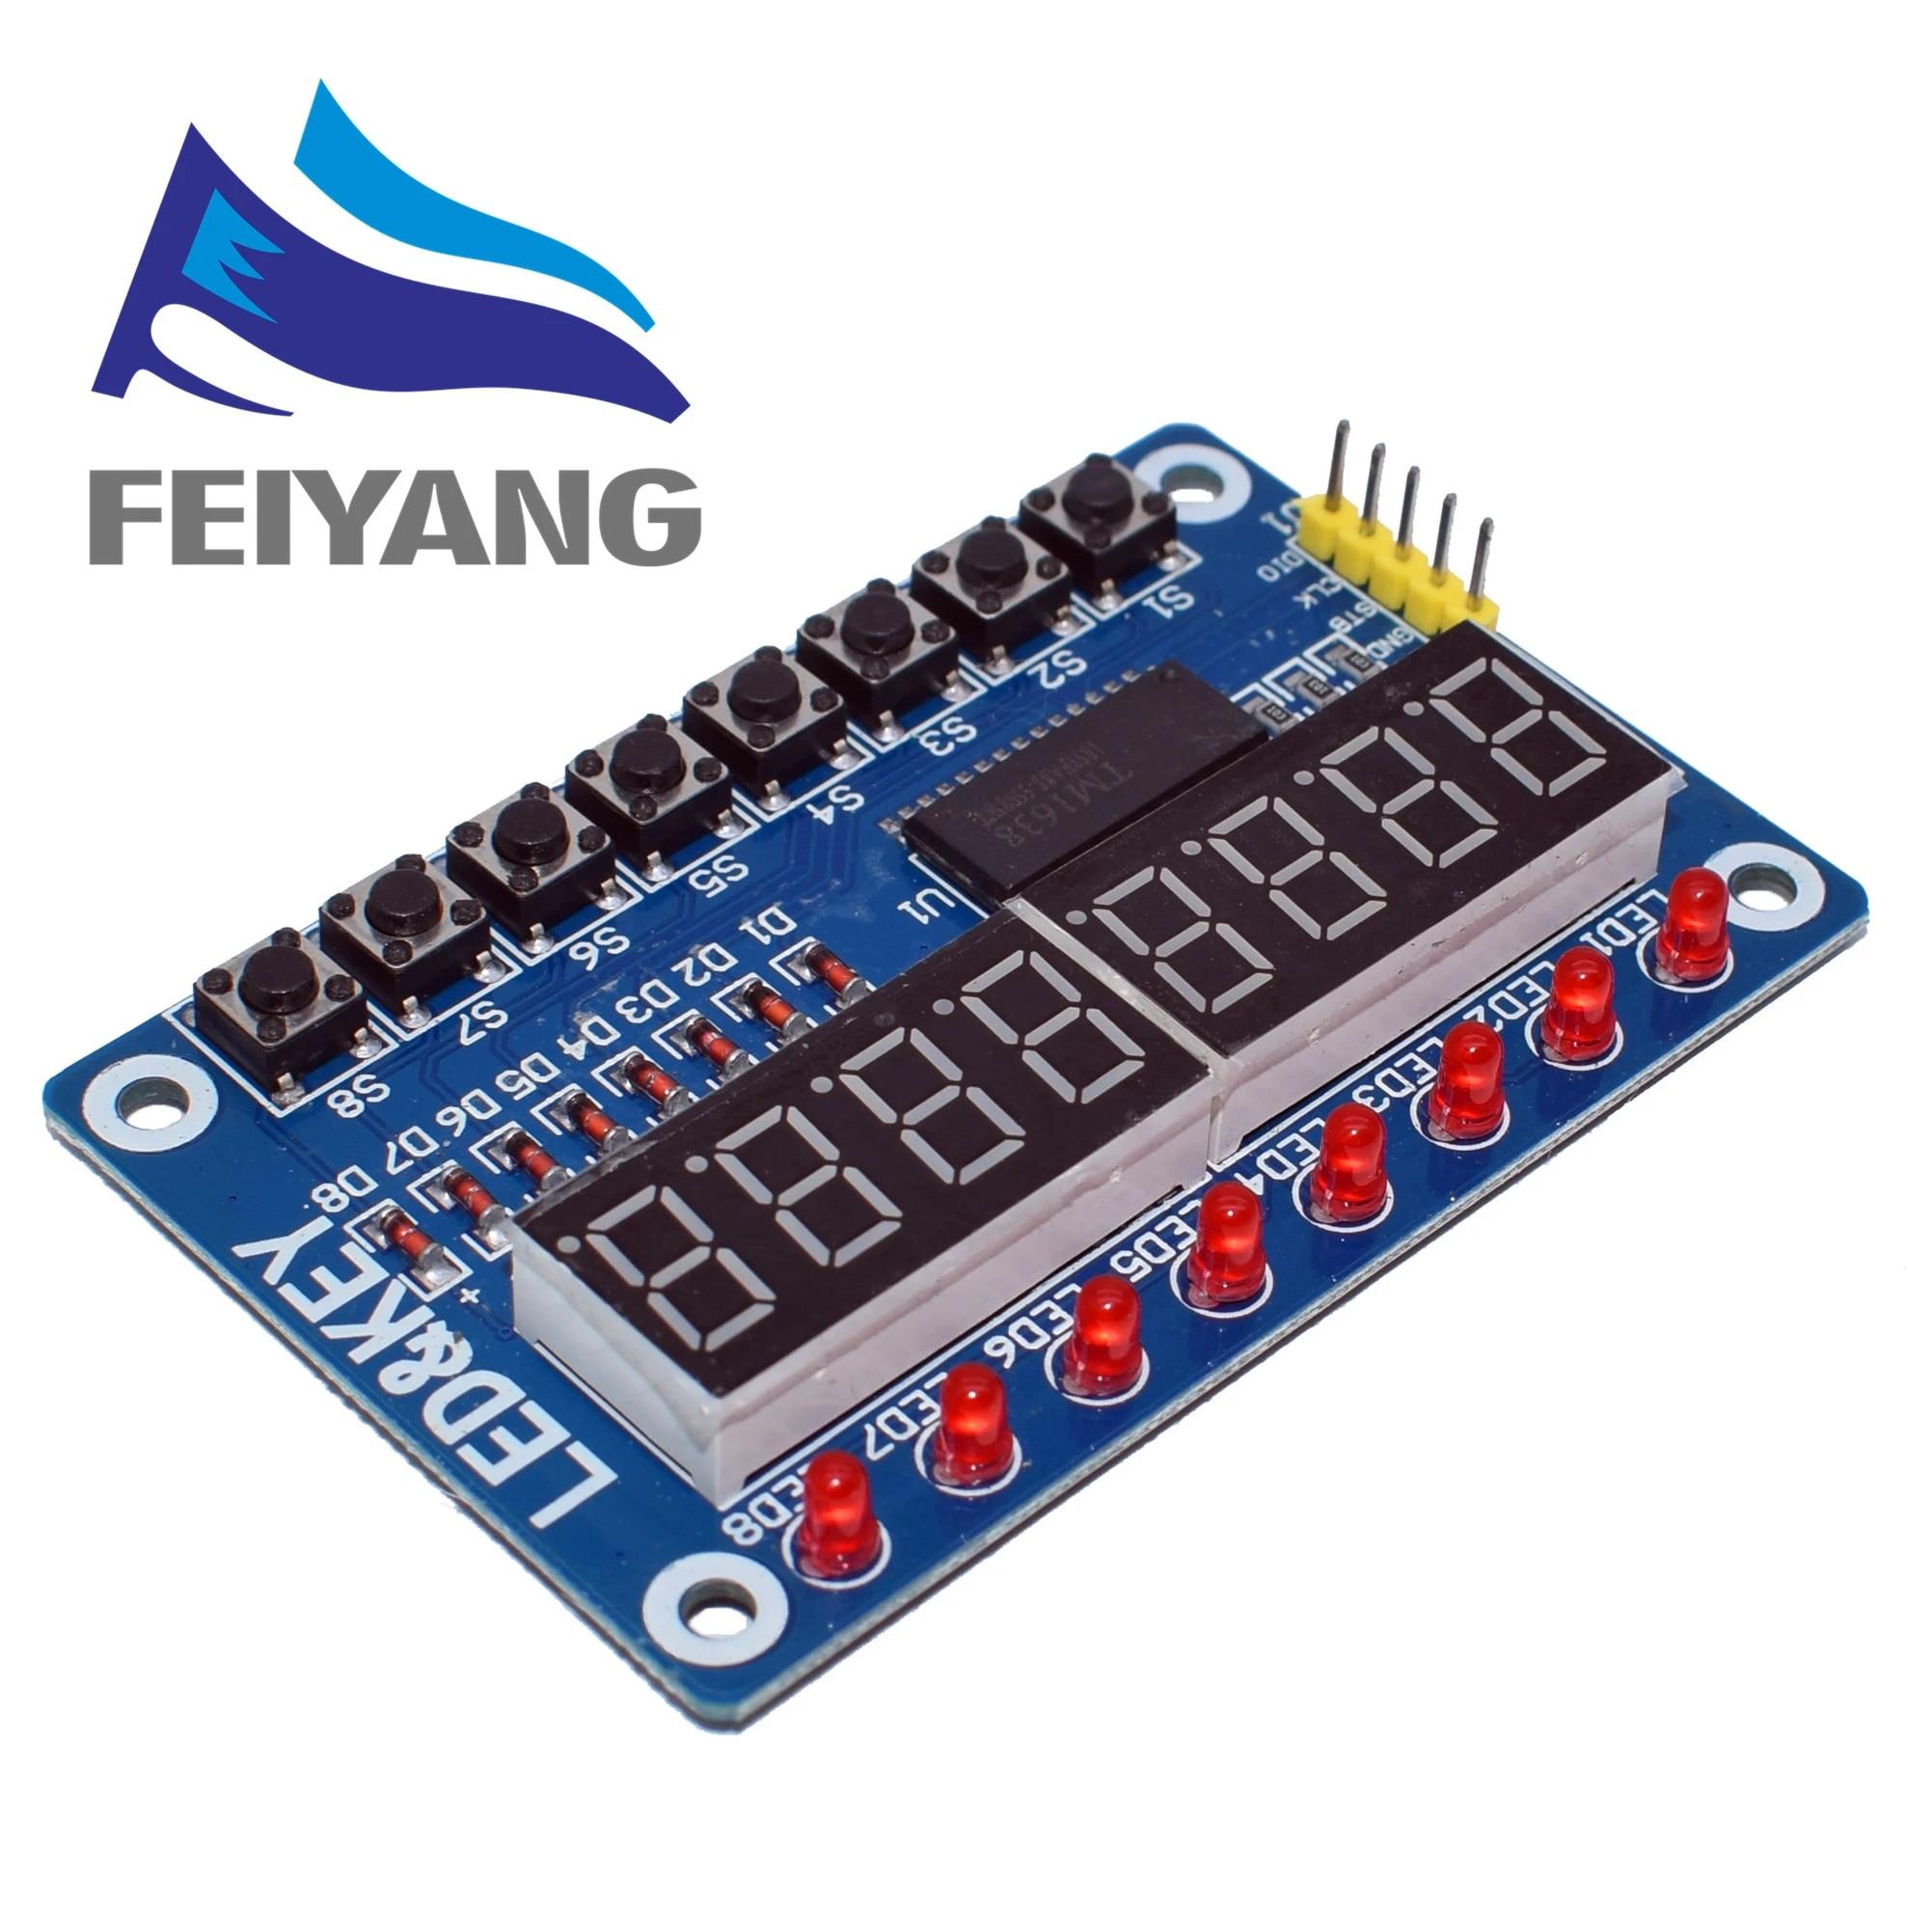 TM1638 Module Key Display AVR 8-Bit Digital LED Tube Display Module